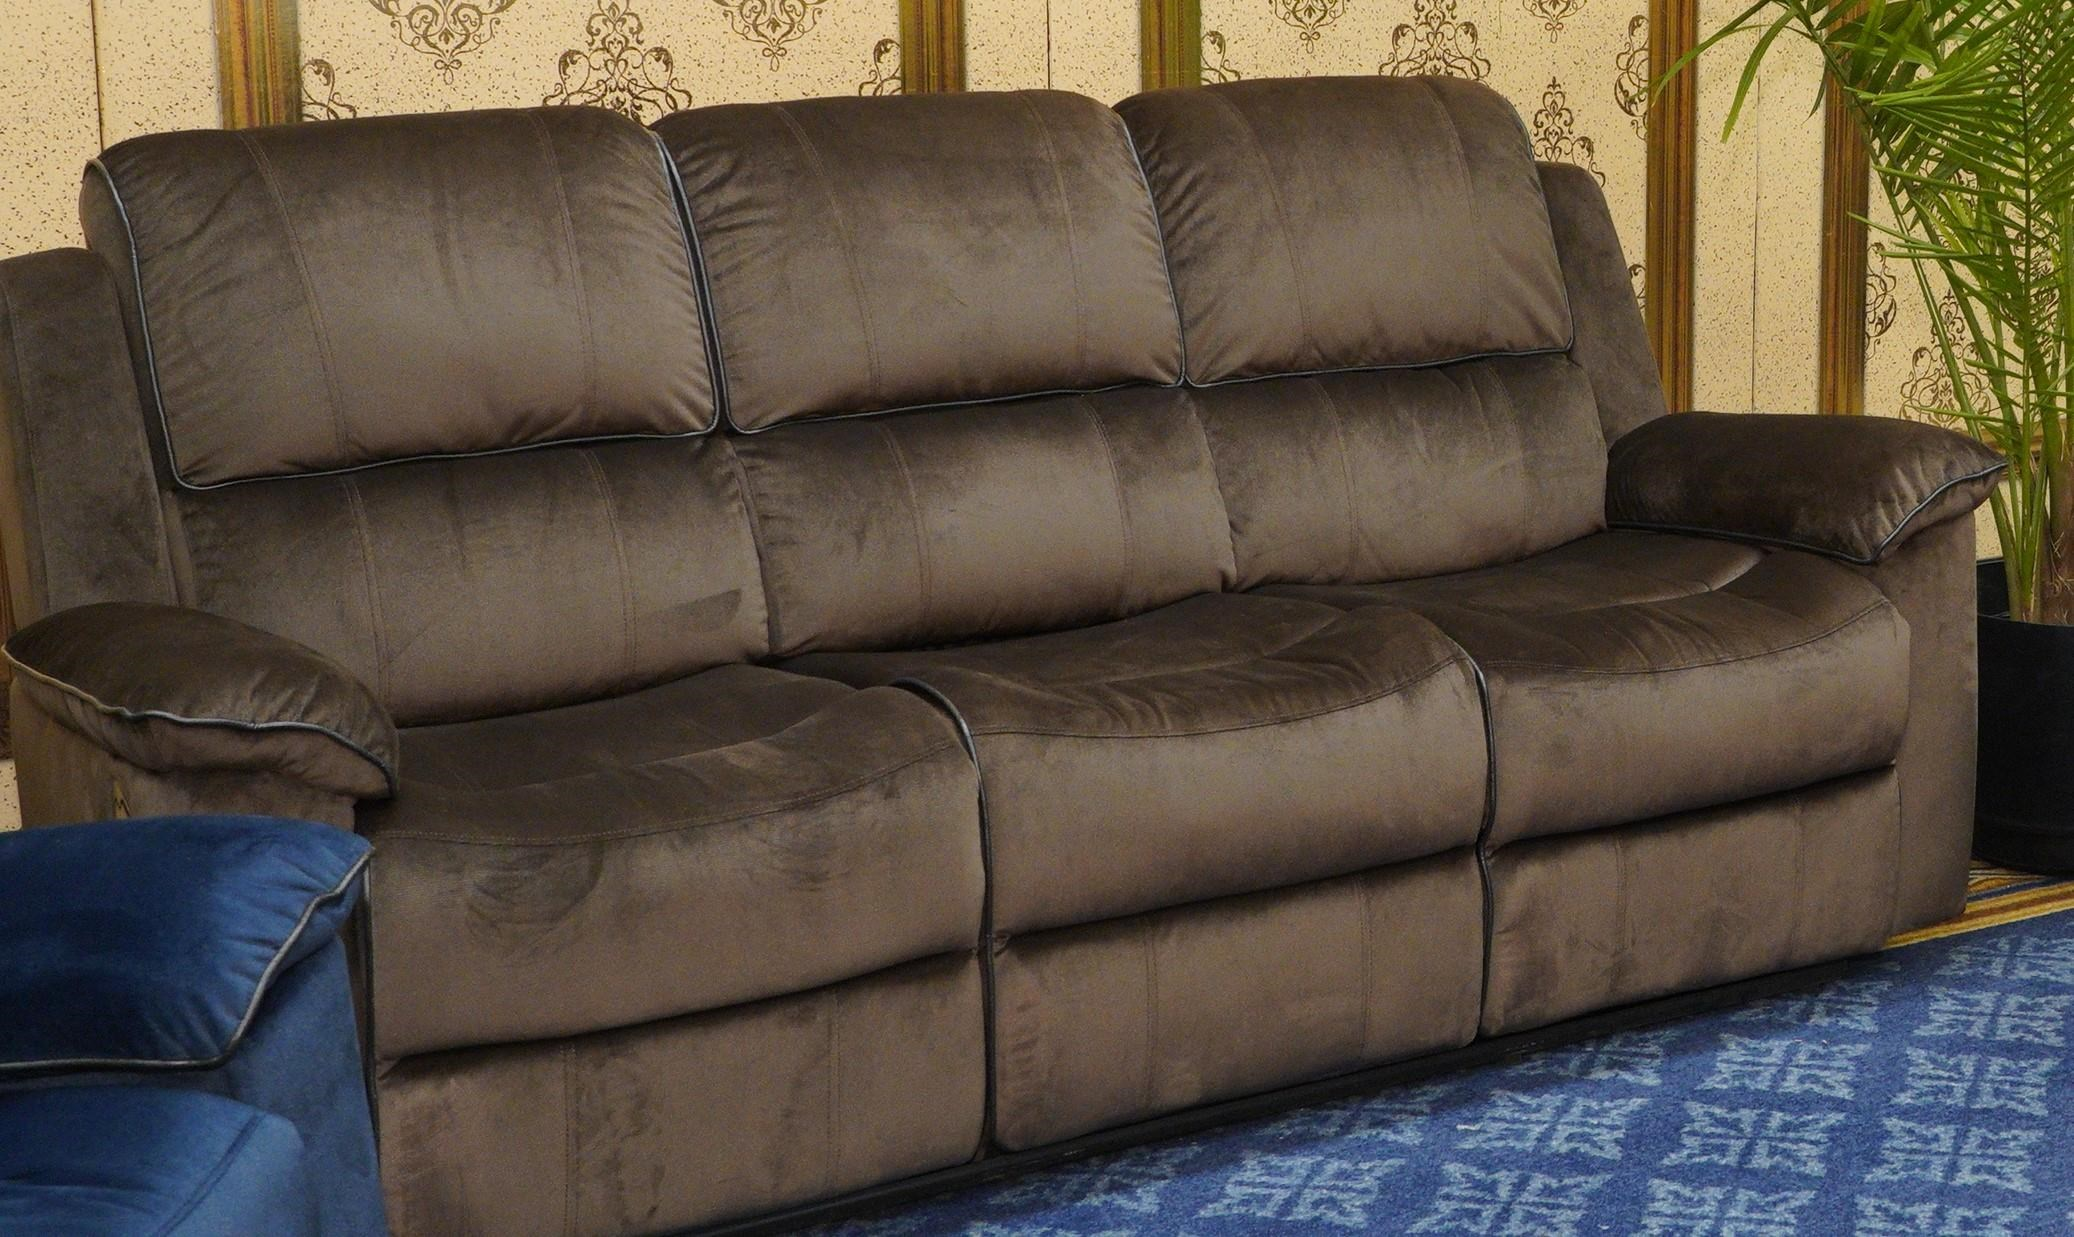 U80183 URBINO Reclining Sofa by Lifestyle at Furniture Fair - North Carolina